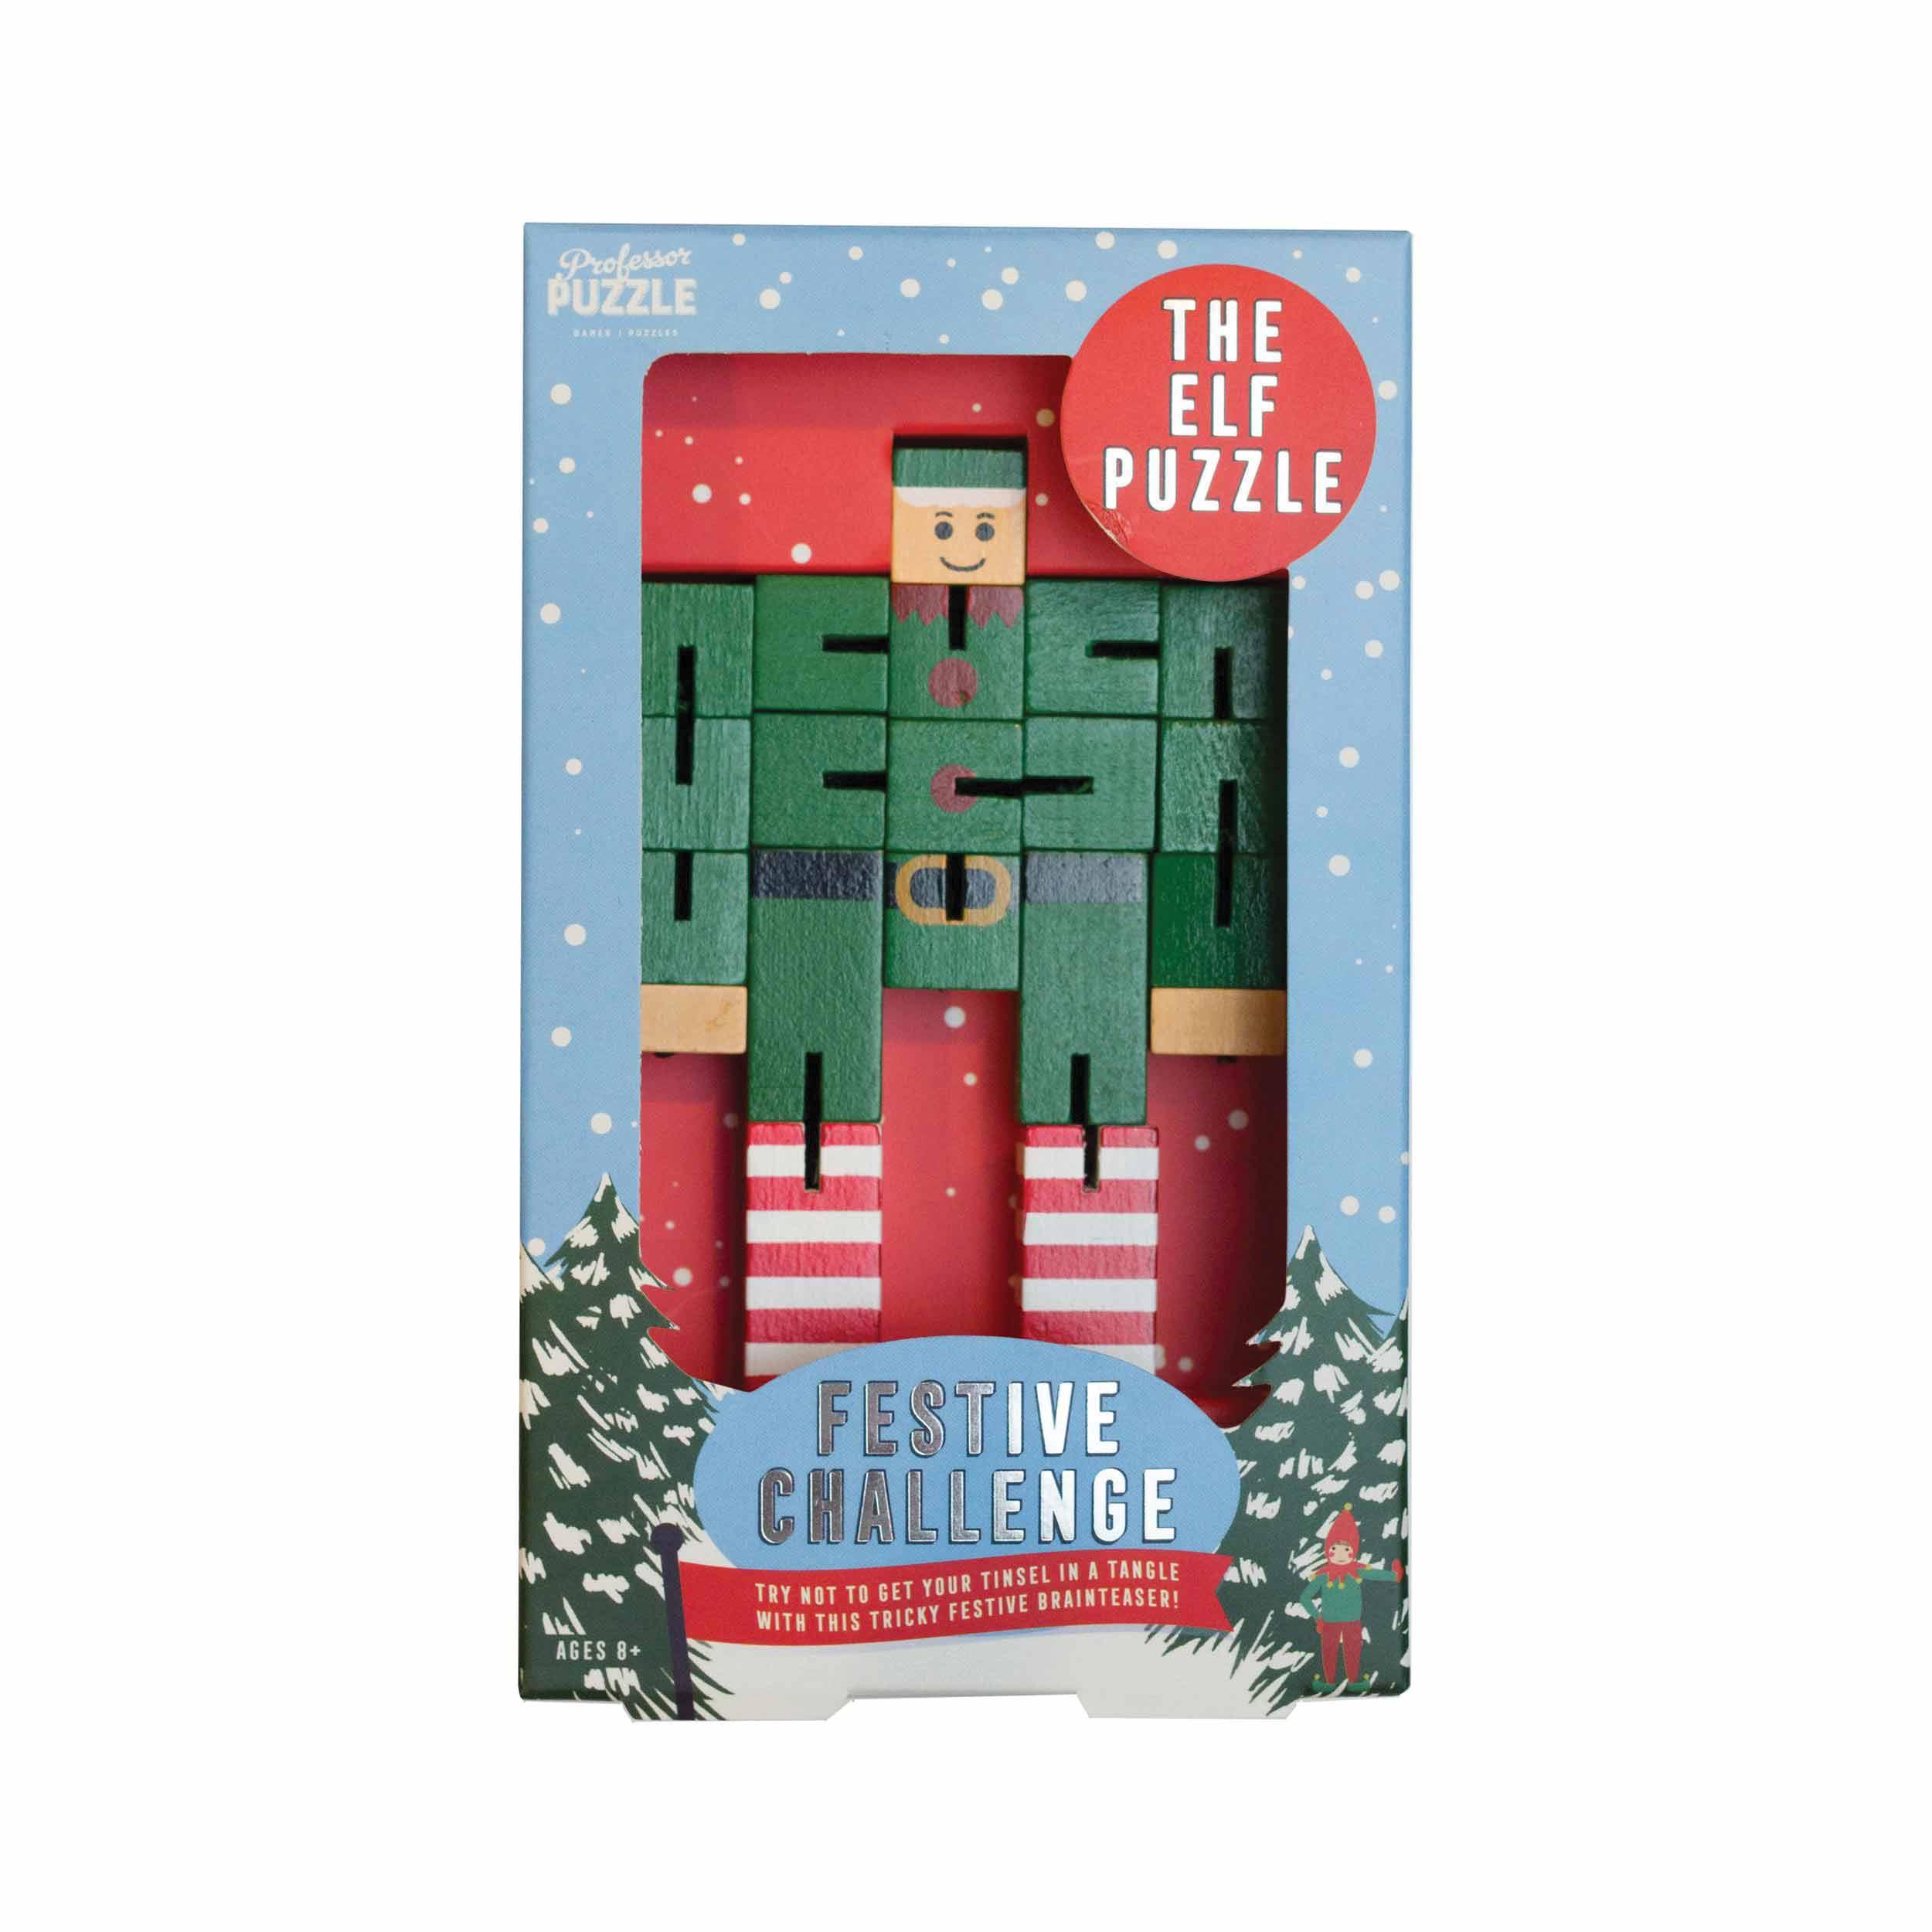 Elf Puzzleman